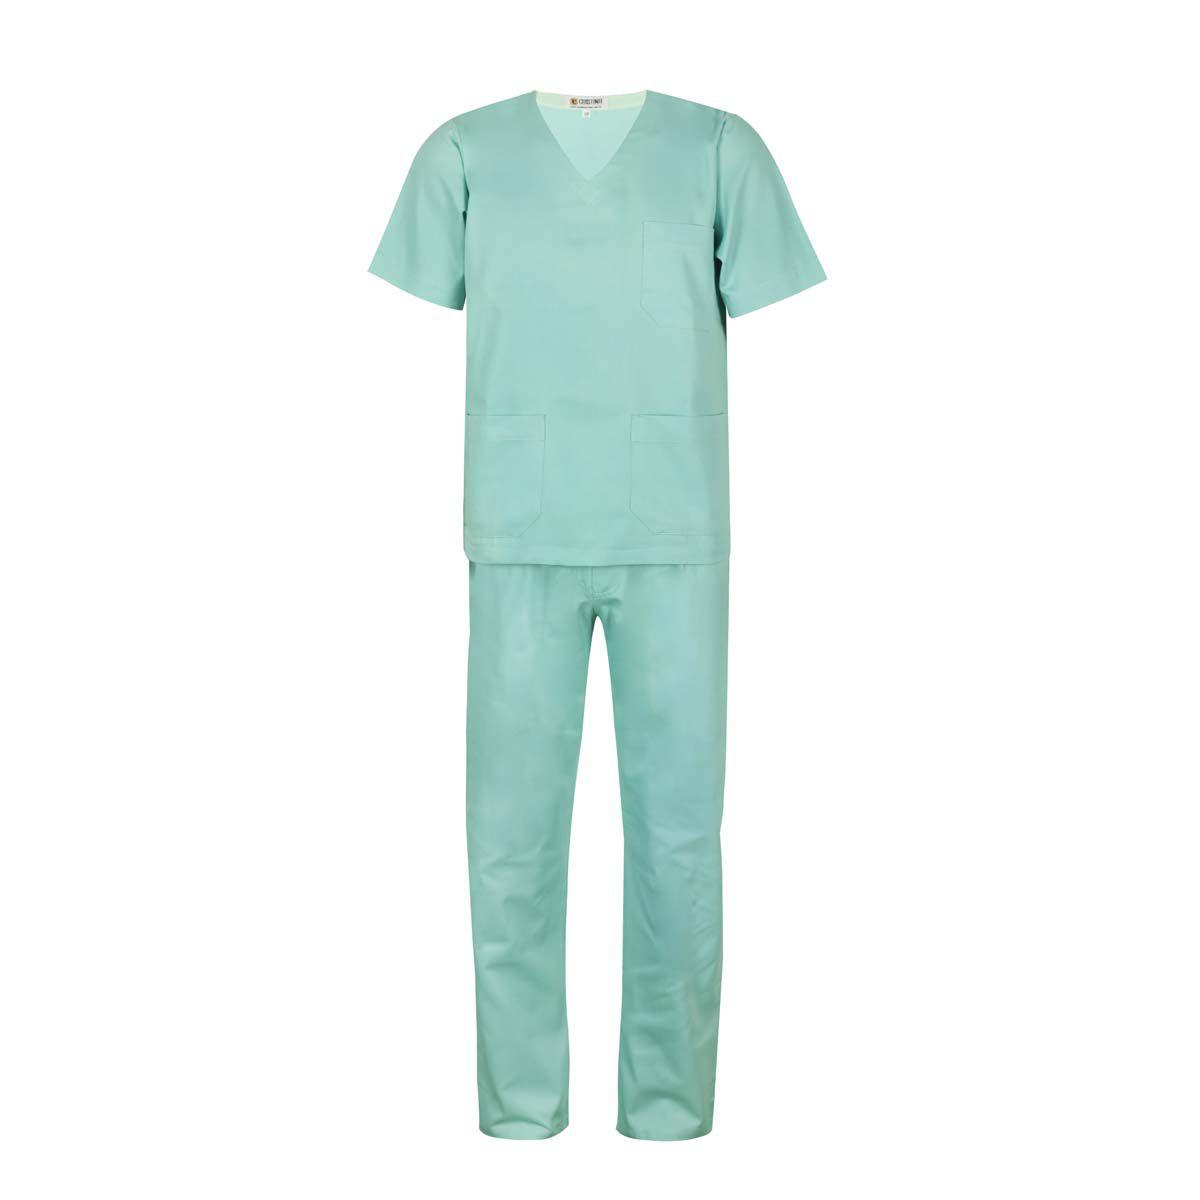 Scrub / Pijama Cirúrgico Gola V Unisex - Verde Água